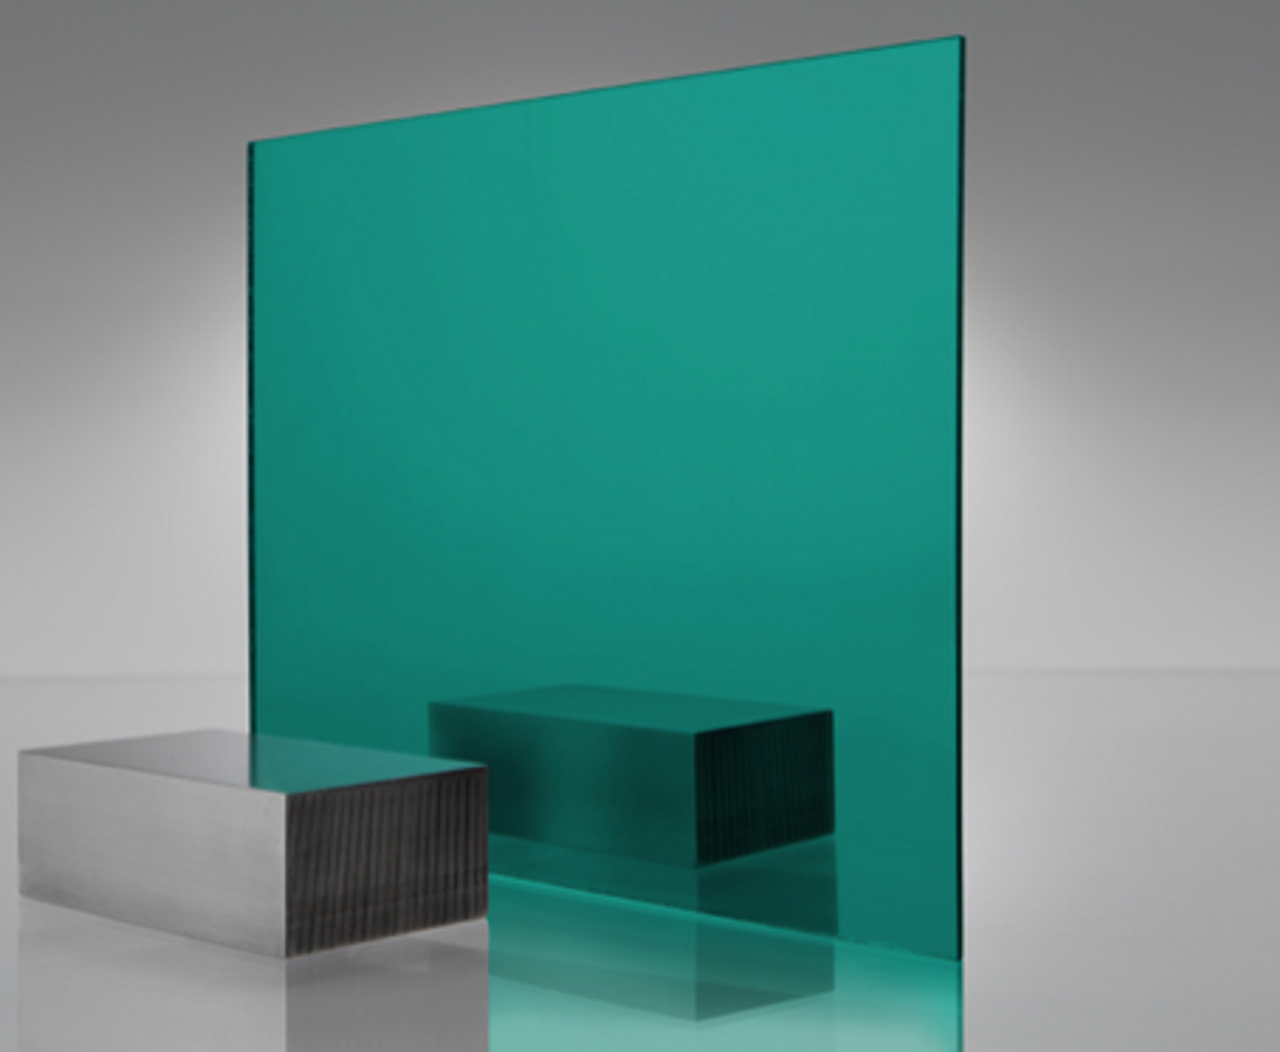 4x8' Mirrored Acrylic TEAL